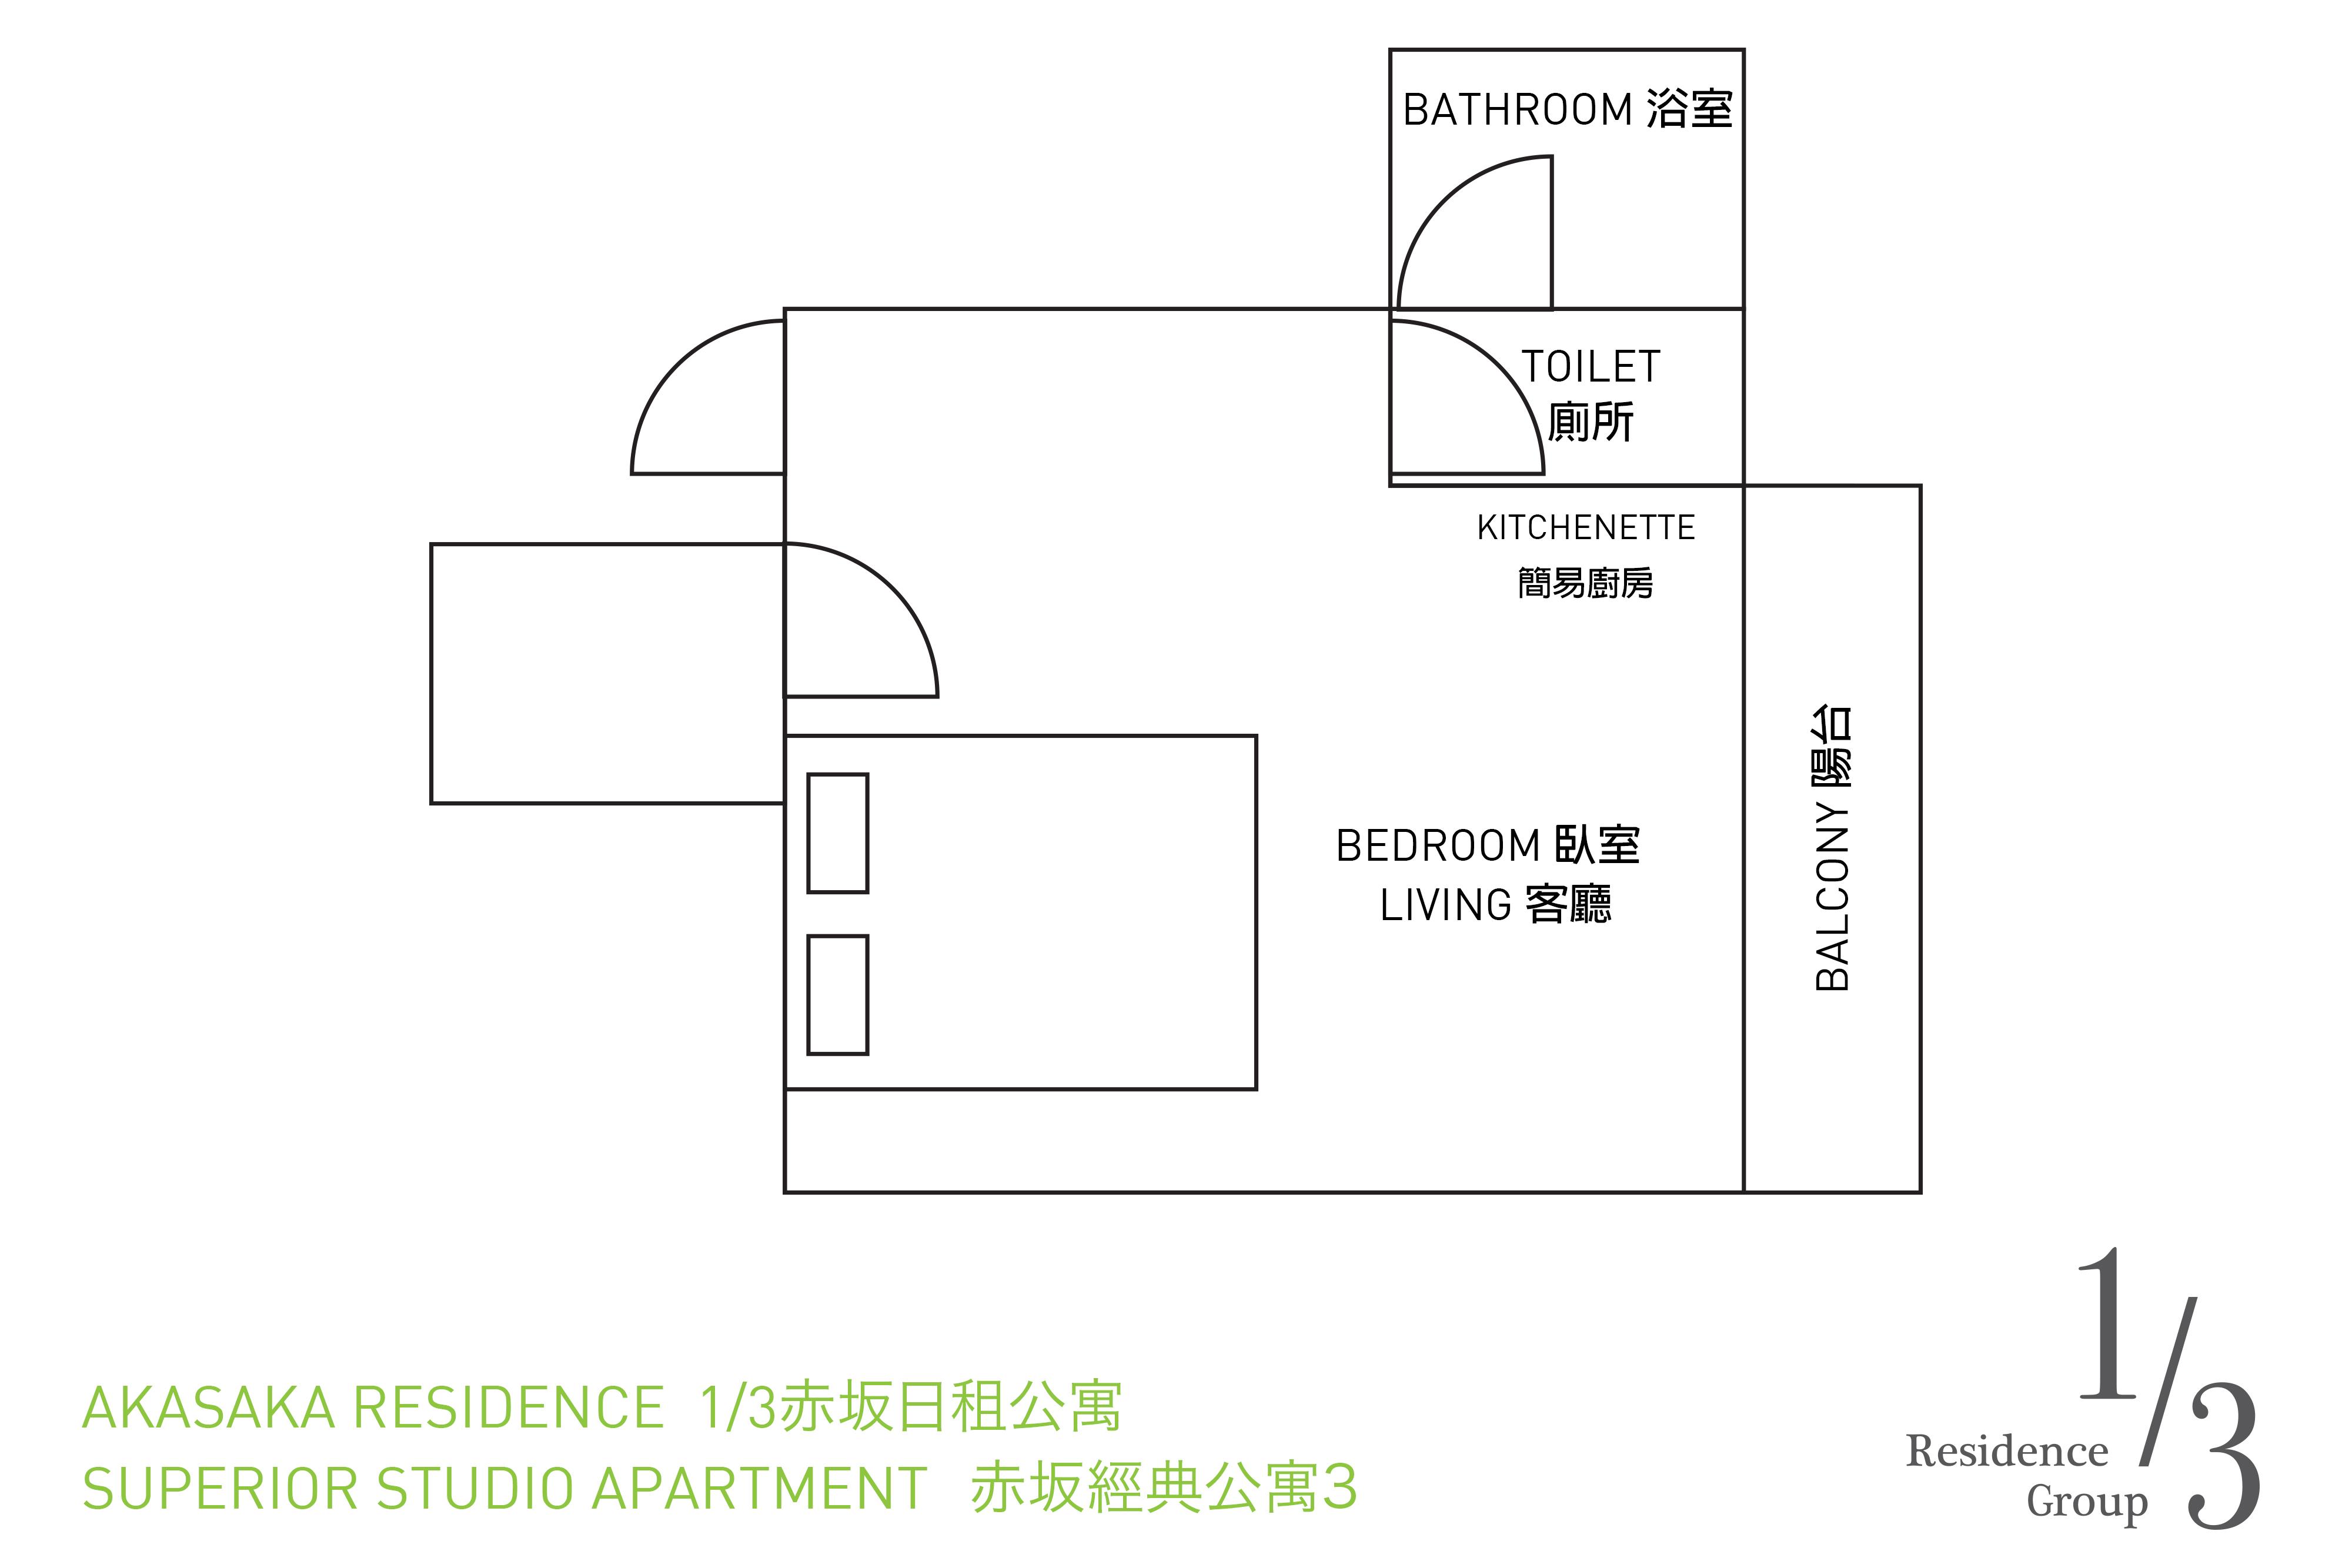 Superior Studio Apartment Akasaka